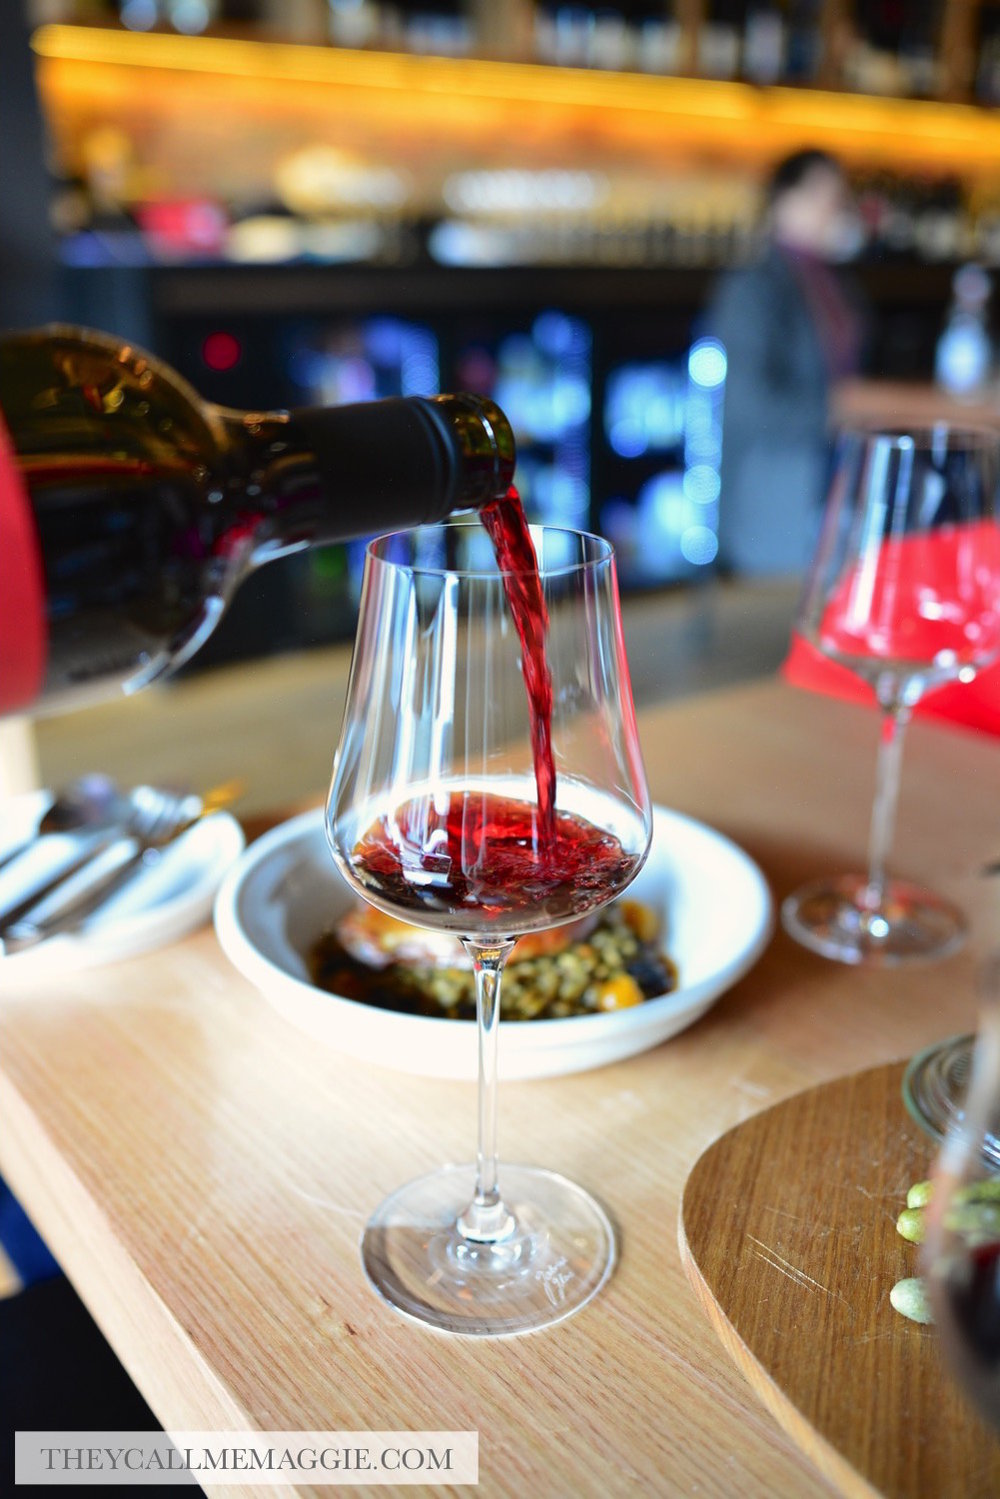 wine-pouring-shot.jpg